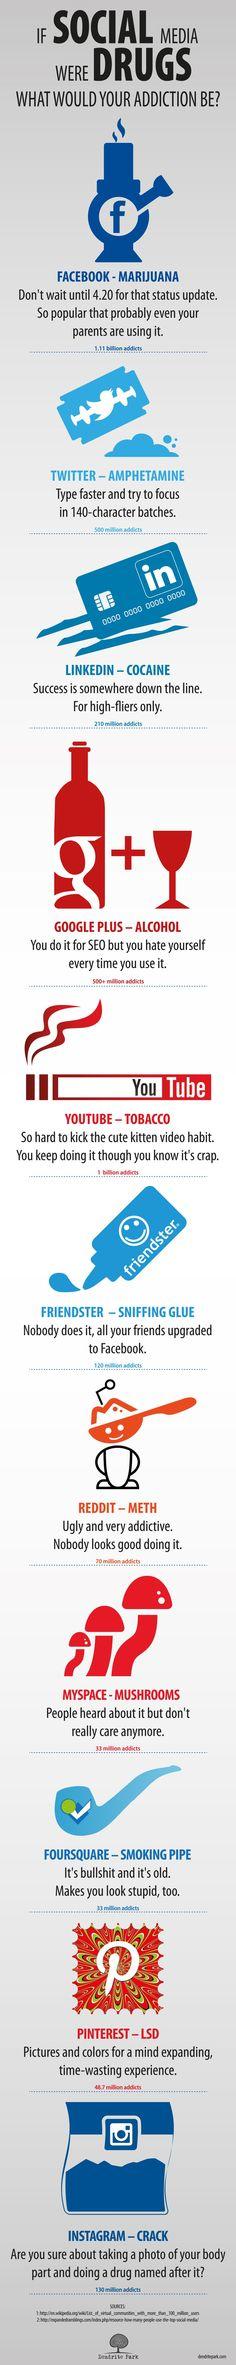 platform, laugh, stuff, funni, social media, infograph, socialmedia, medium, drug